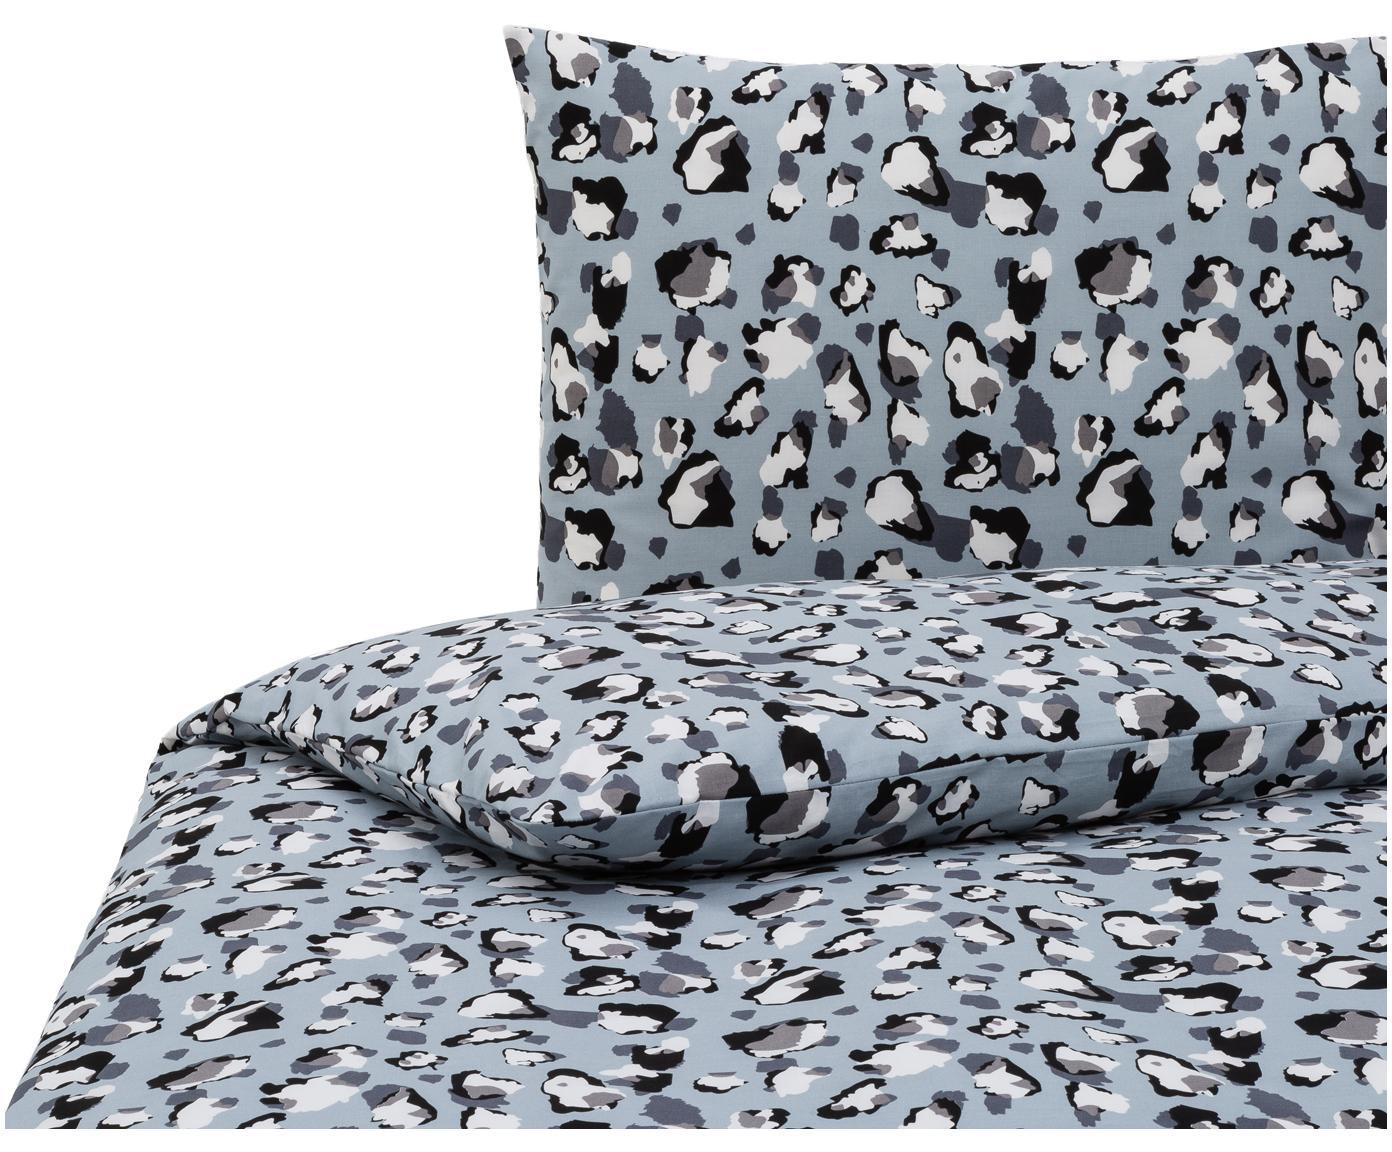 Dekbedovertrek Famke Blue, Katoen, Lichtblauw, wit, grijs, zwart, 140 x 220 cm